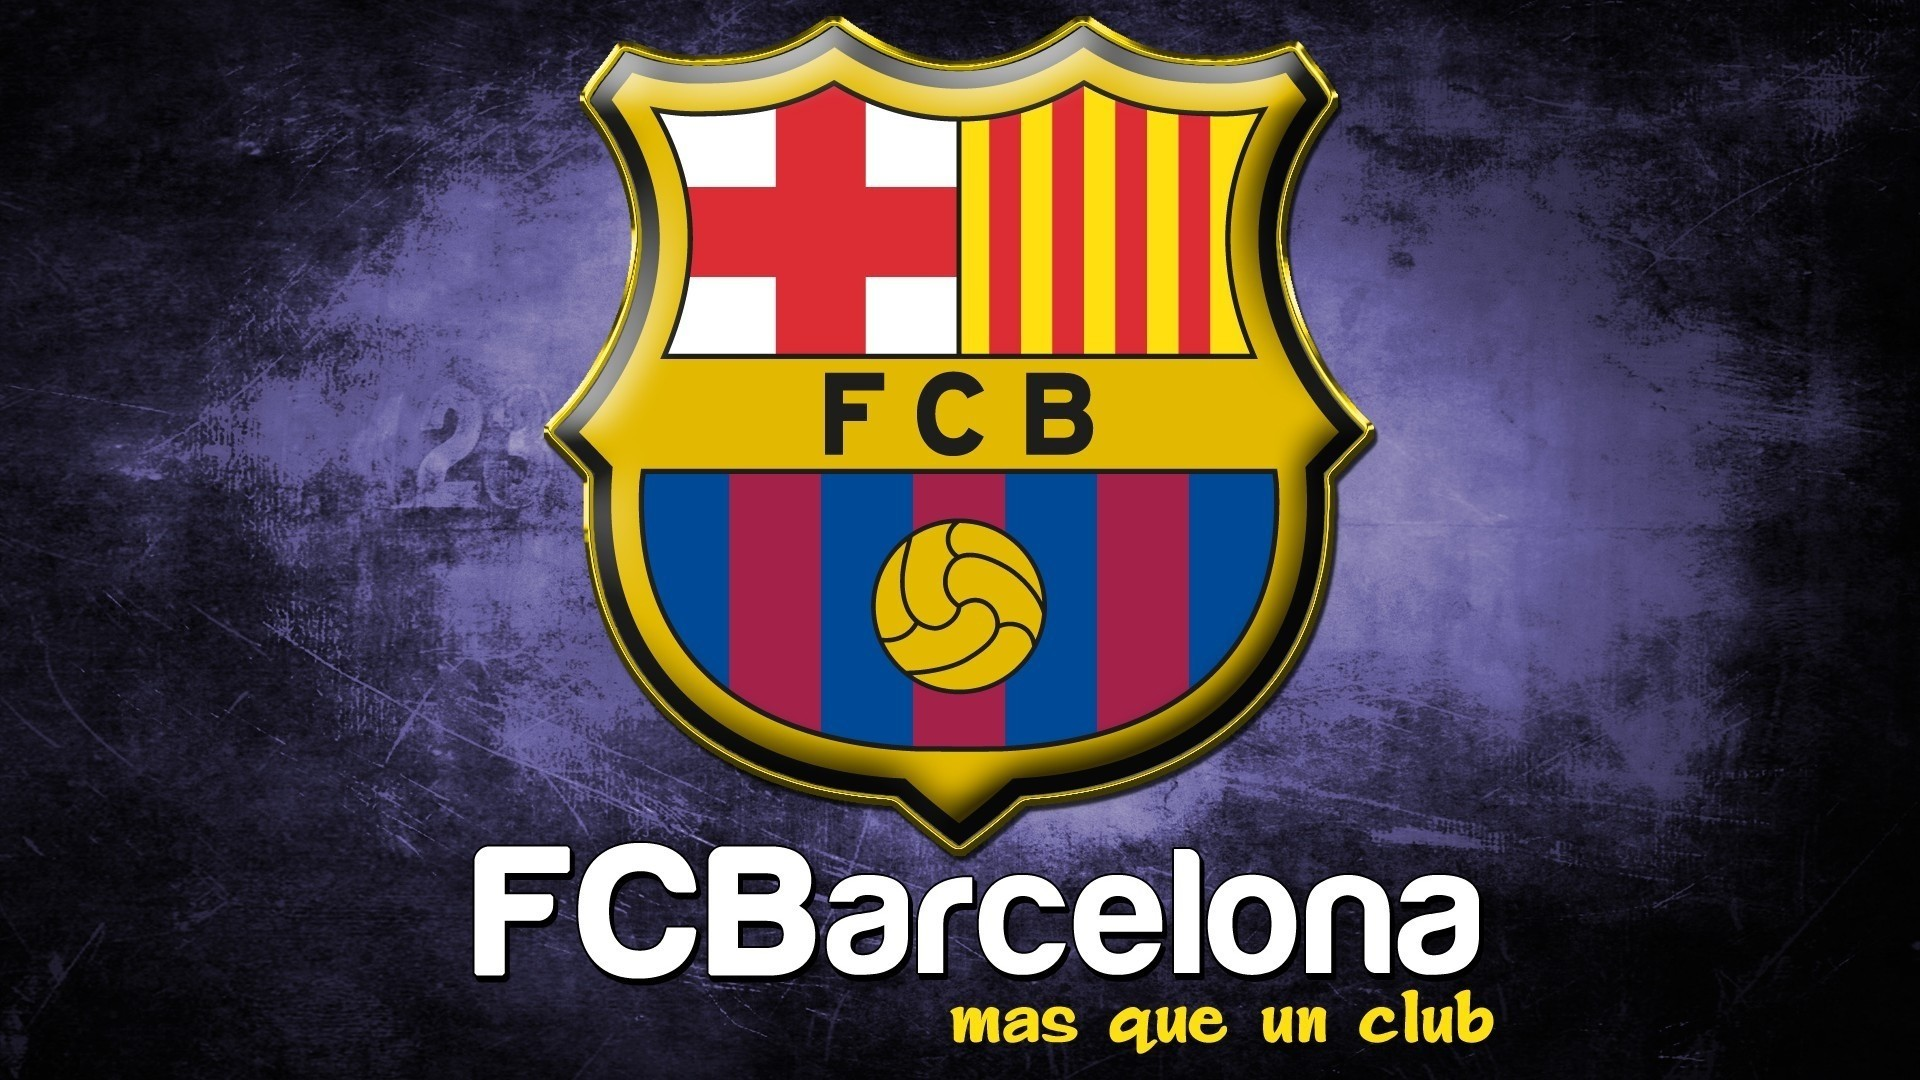 Logo Barcelona Wallpaper Terbaru 2018 ·â' WallpaperTag